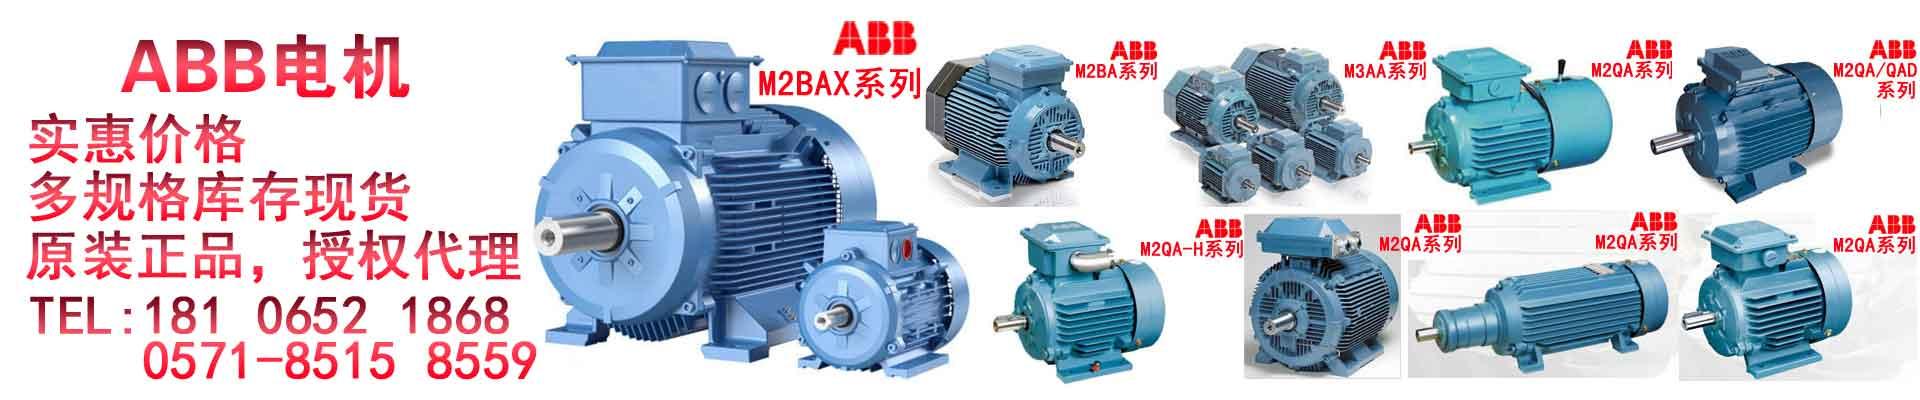 ABB电机,ABB电动机,ABB电机代理,ABB电动机一级代理-首页banner图片